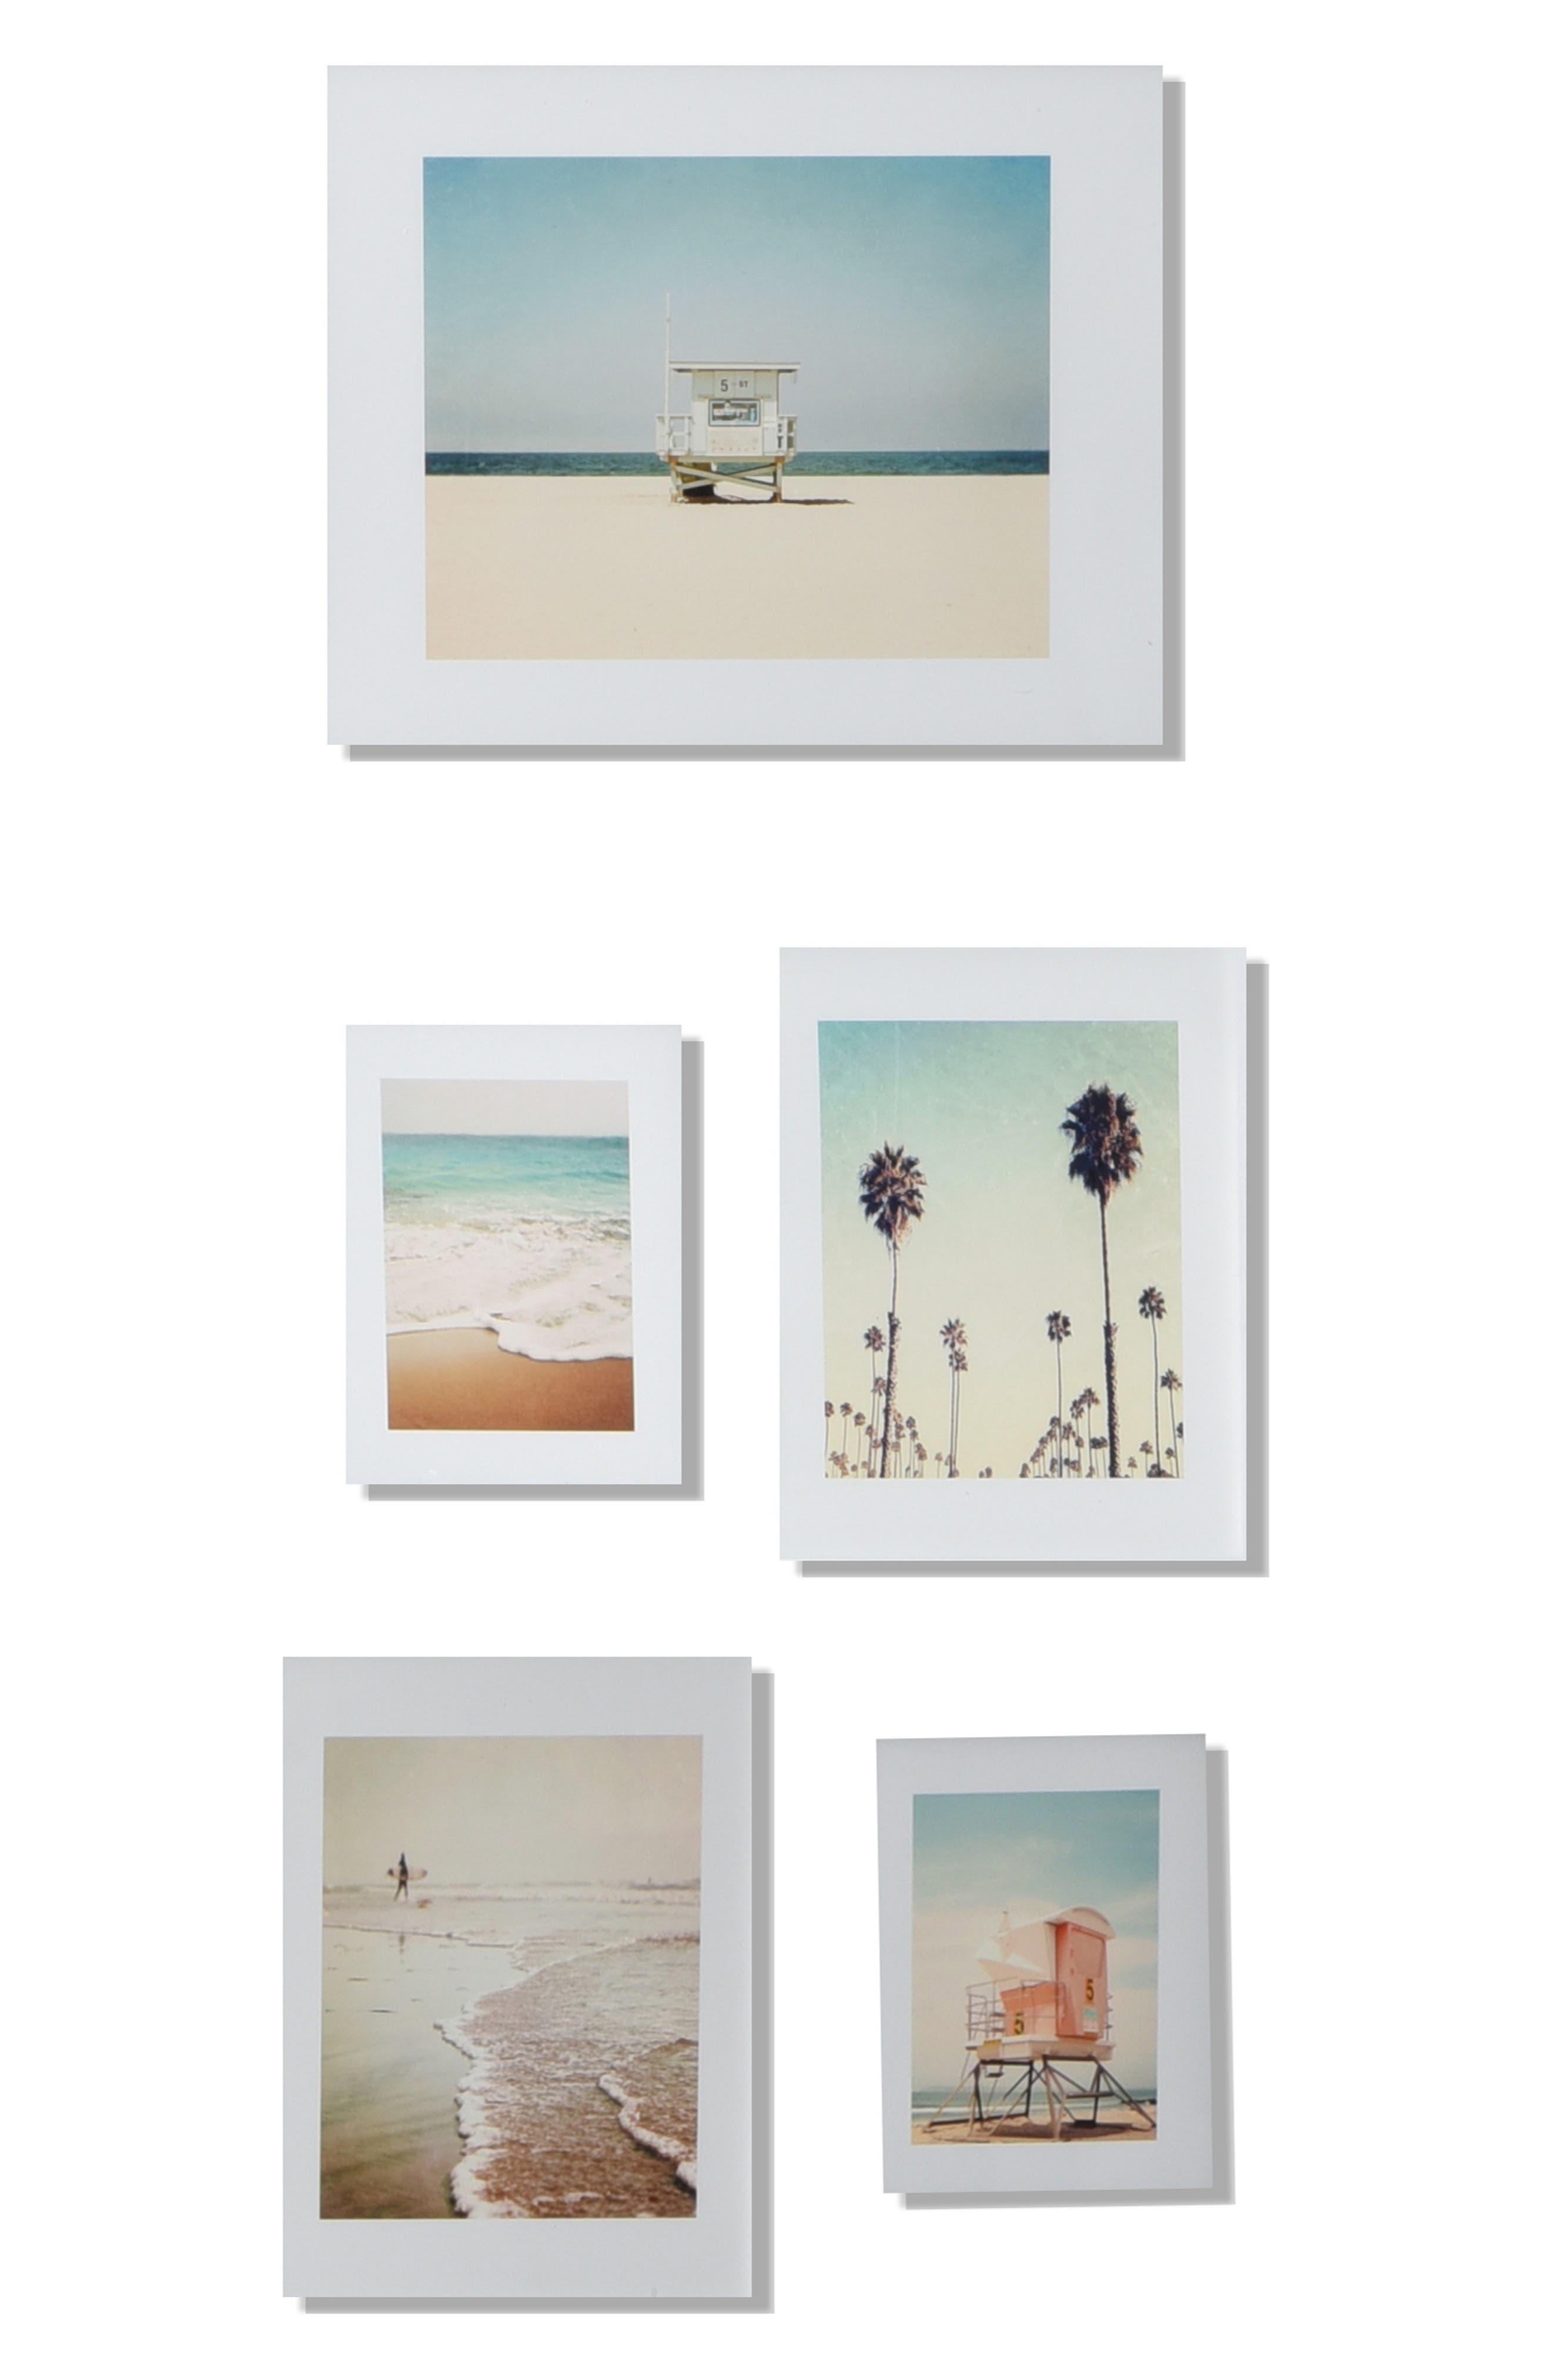 DENY DESIGNS, '5th Street' Wall Art Print Set, Alternate thumbnail 4, color, WHITE